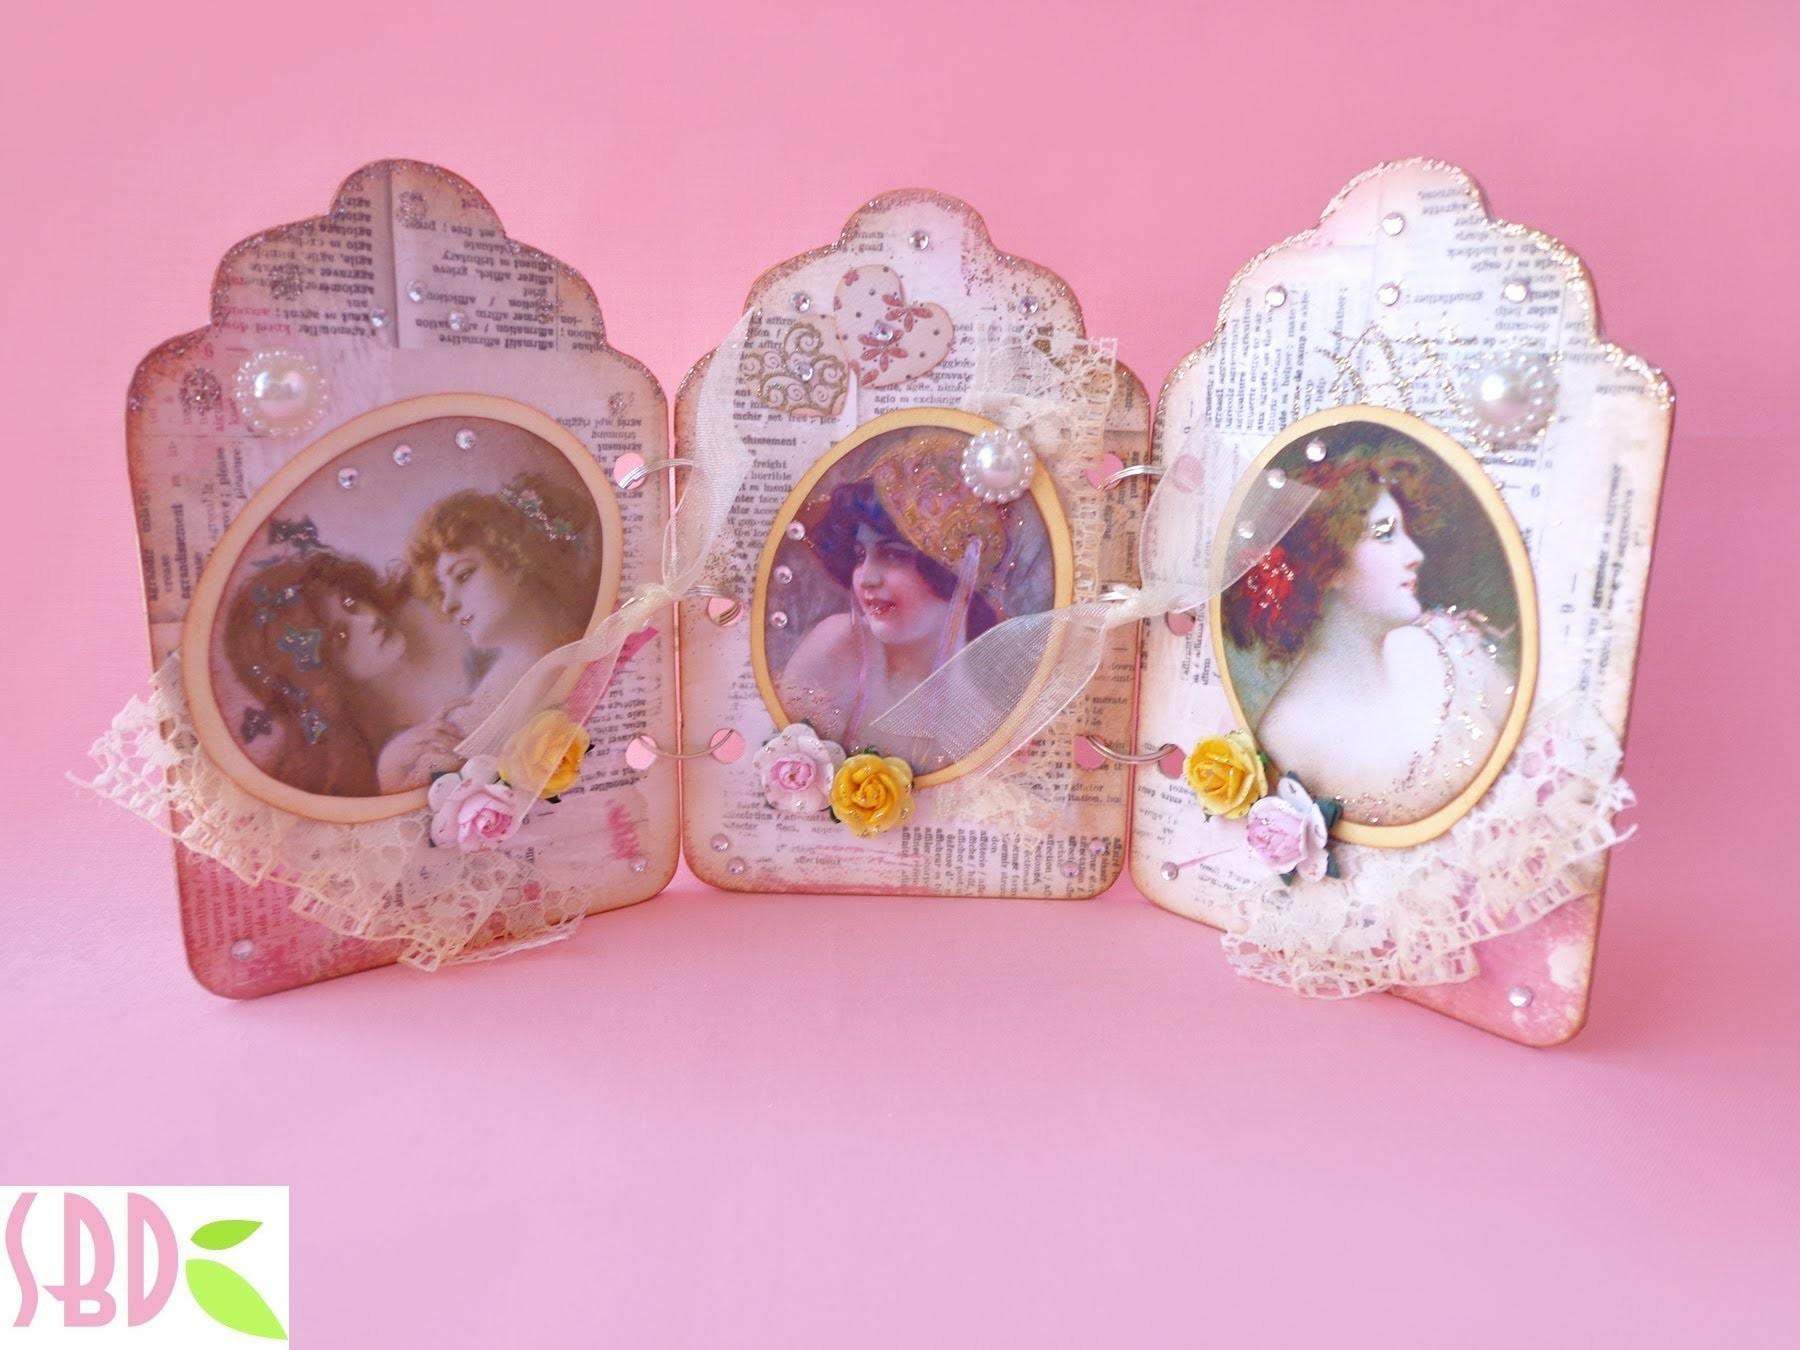 Scrapbooking Cornice Trittico Shabby Chic - Triptych Shabby chic Frame